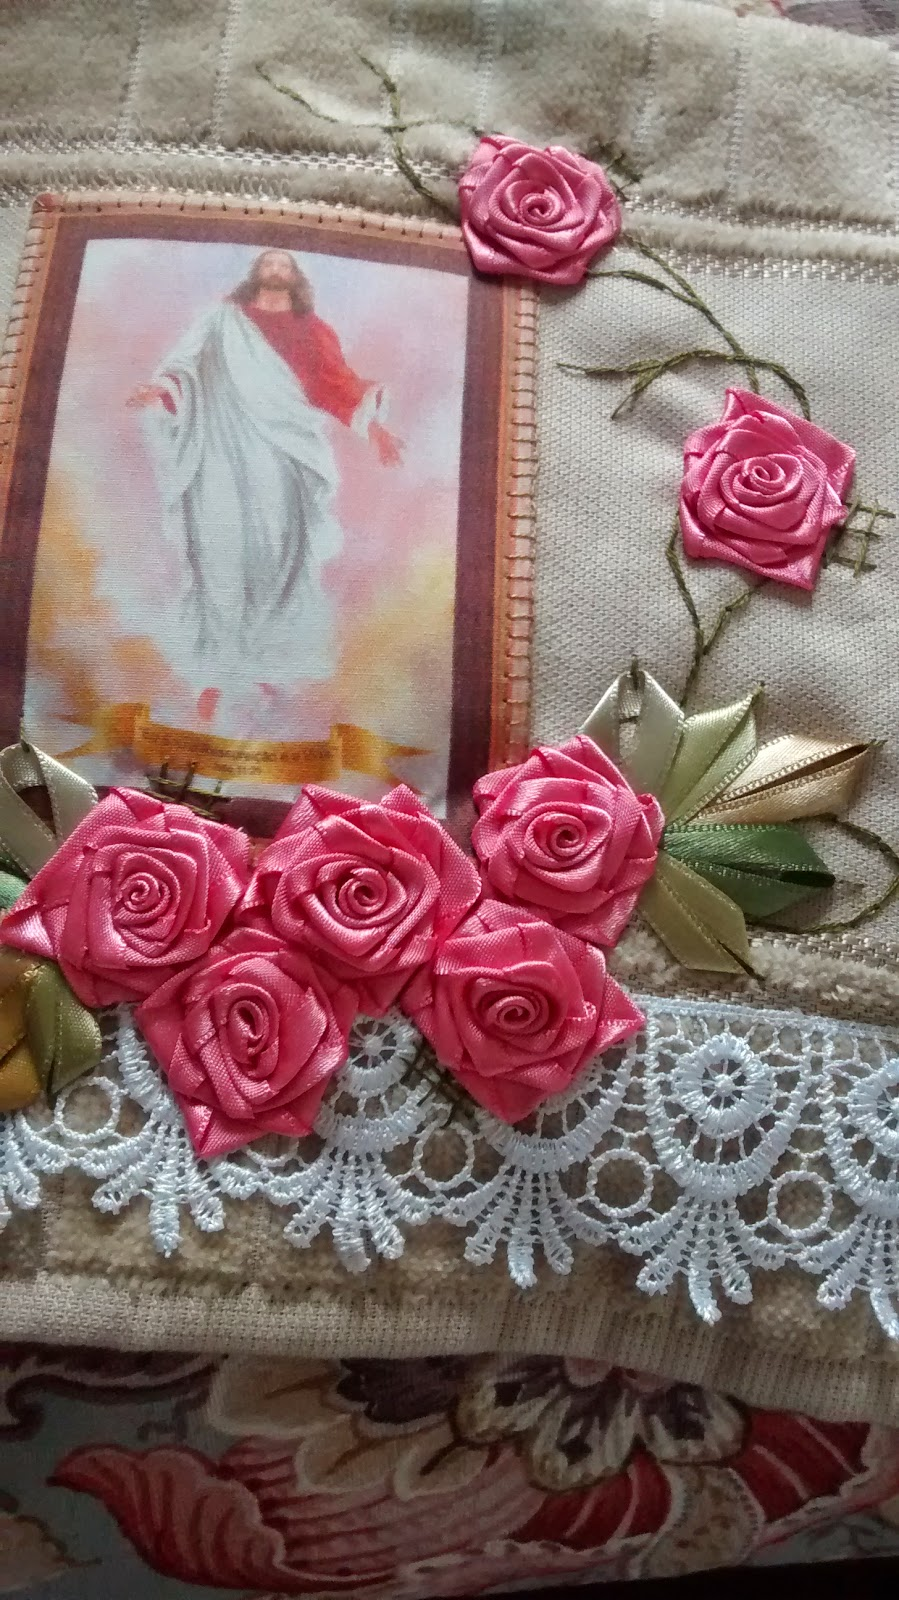 Armarinho Fernando Tatuape ~ LOY HANDCRAFTS, TOWELS EMBROYDERED WITH SATIN RIBBON ROSES JESUS